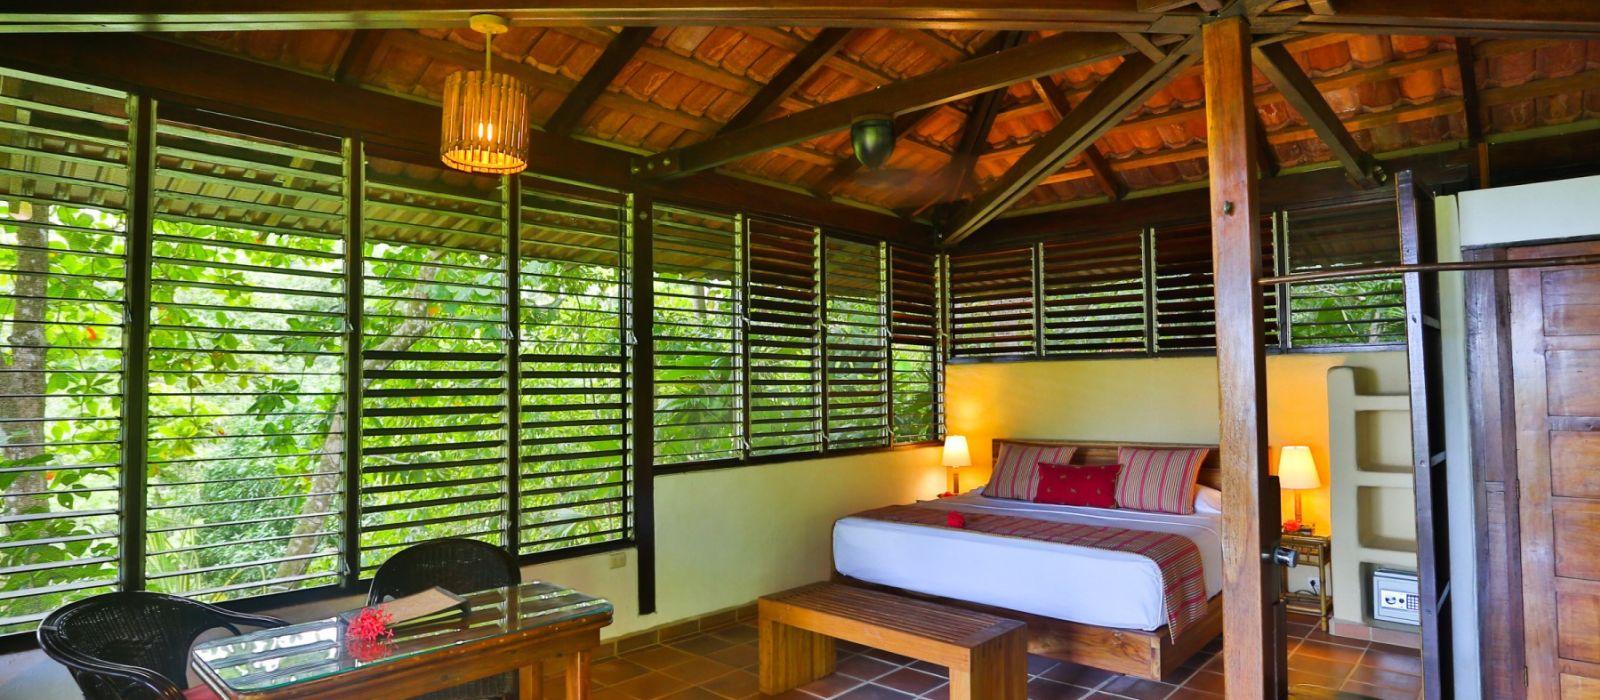 Hotel El Remanso Rainforest Wildlife Lodge Costa Rica